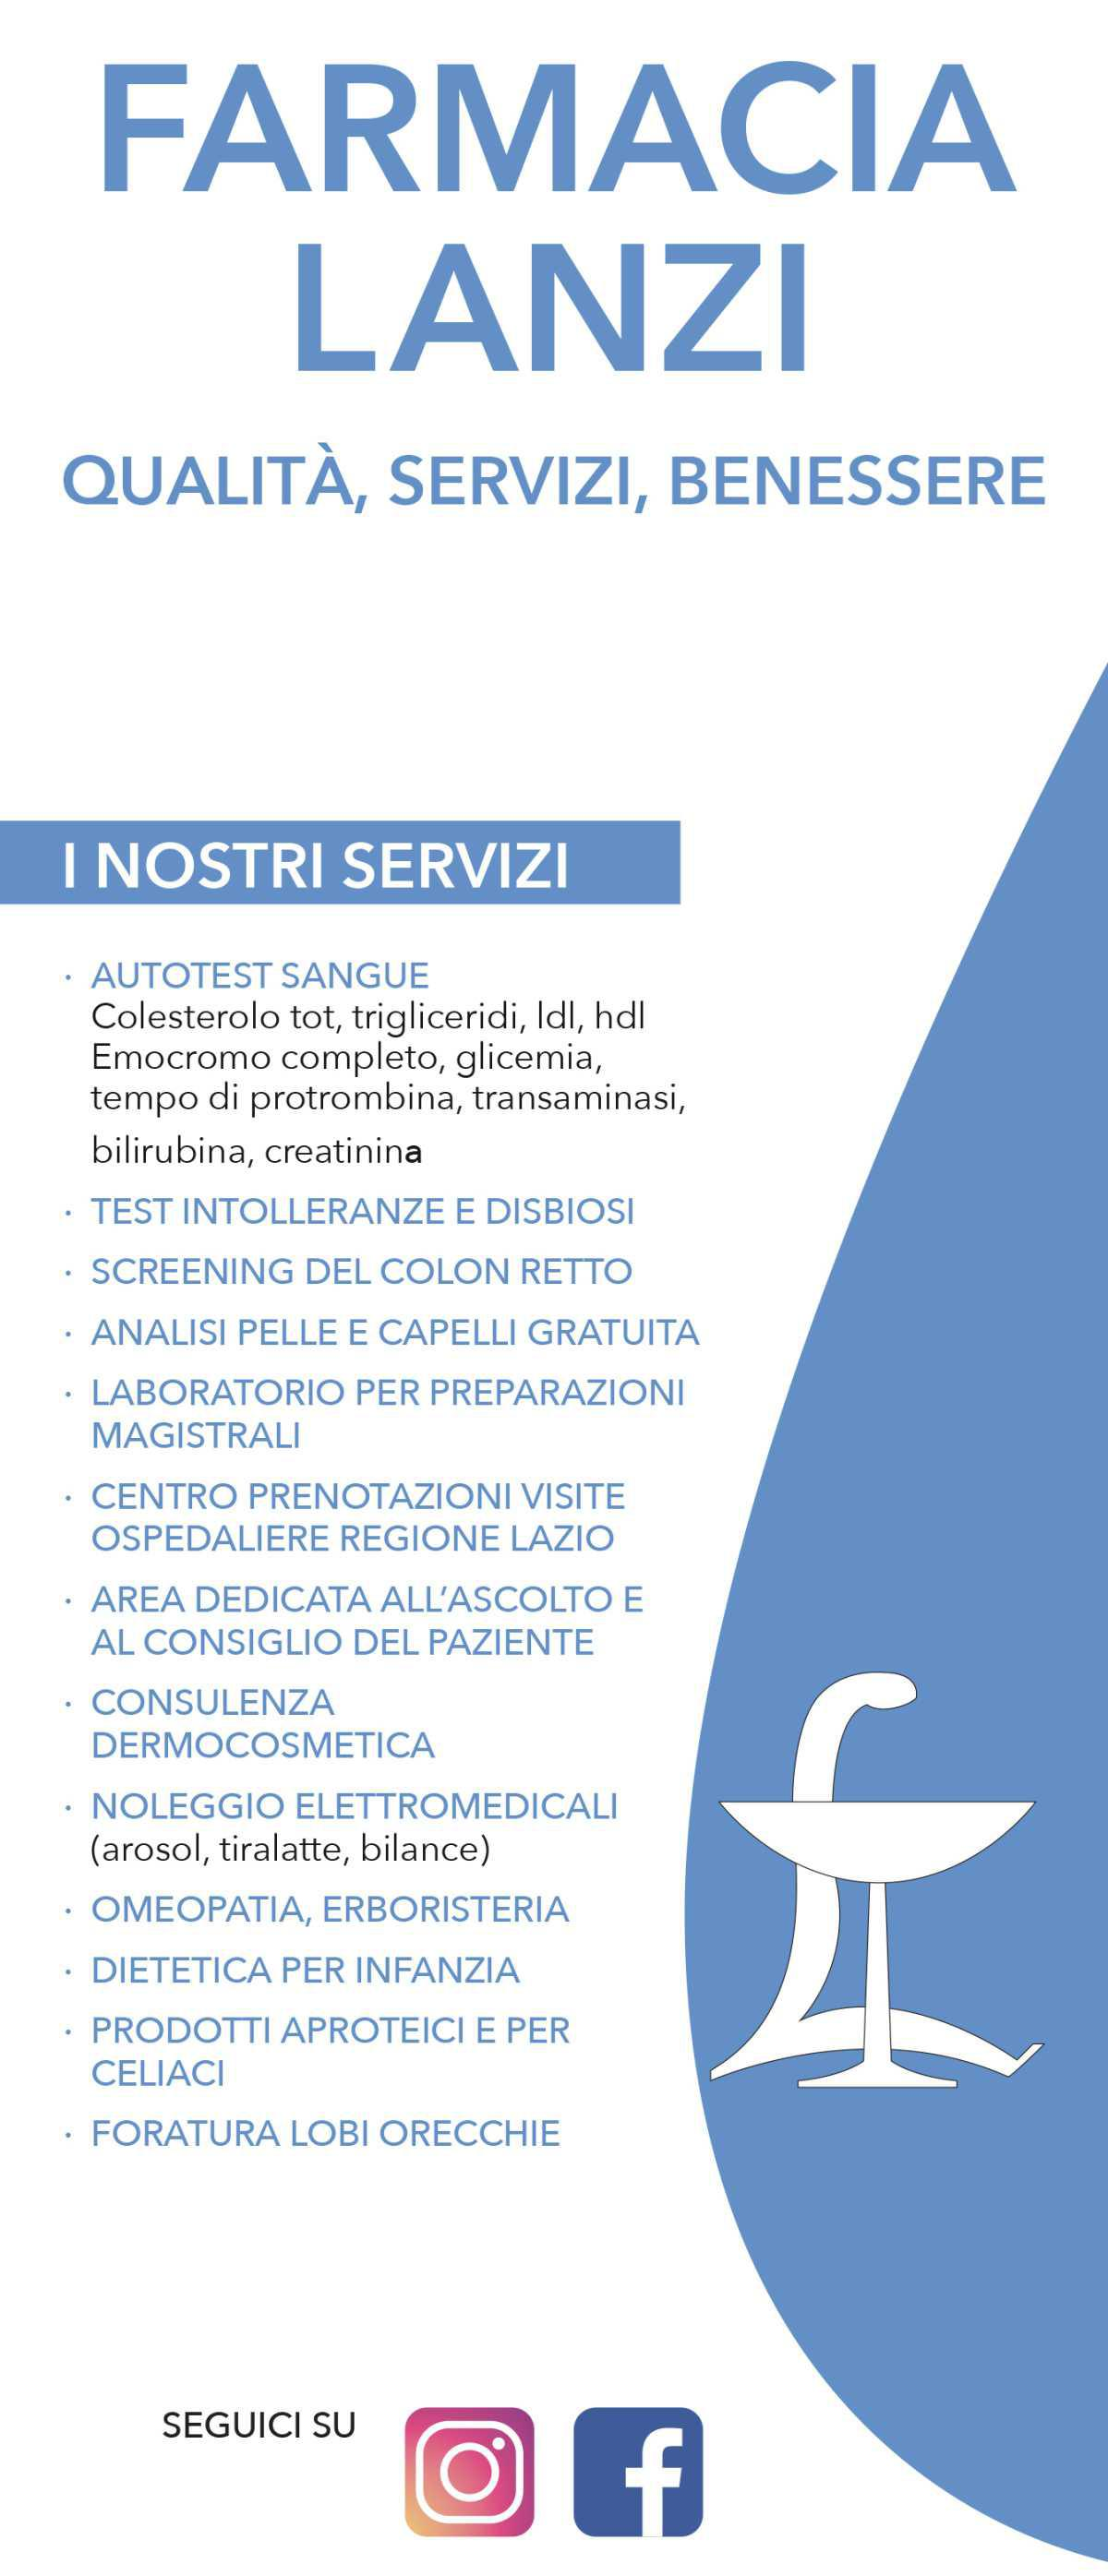 Farmacia Lanzi